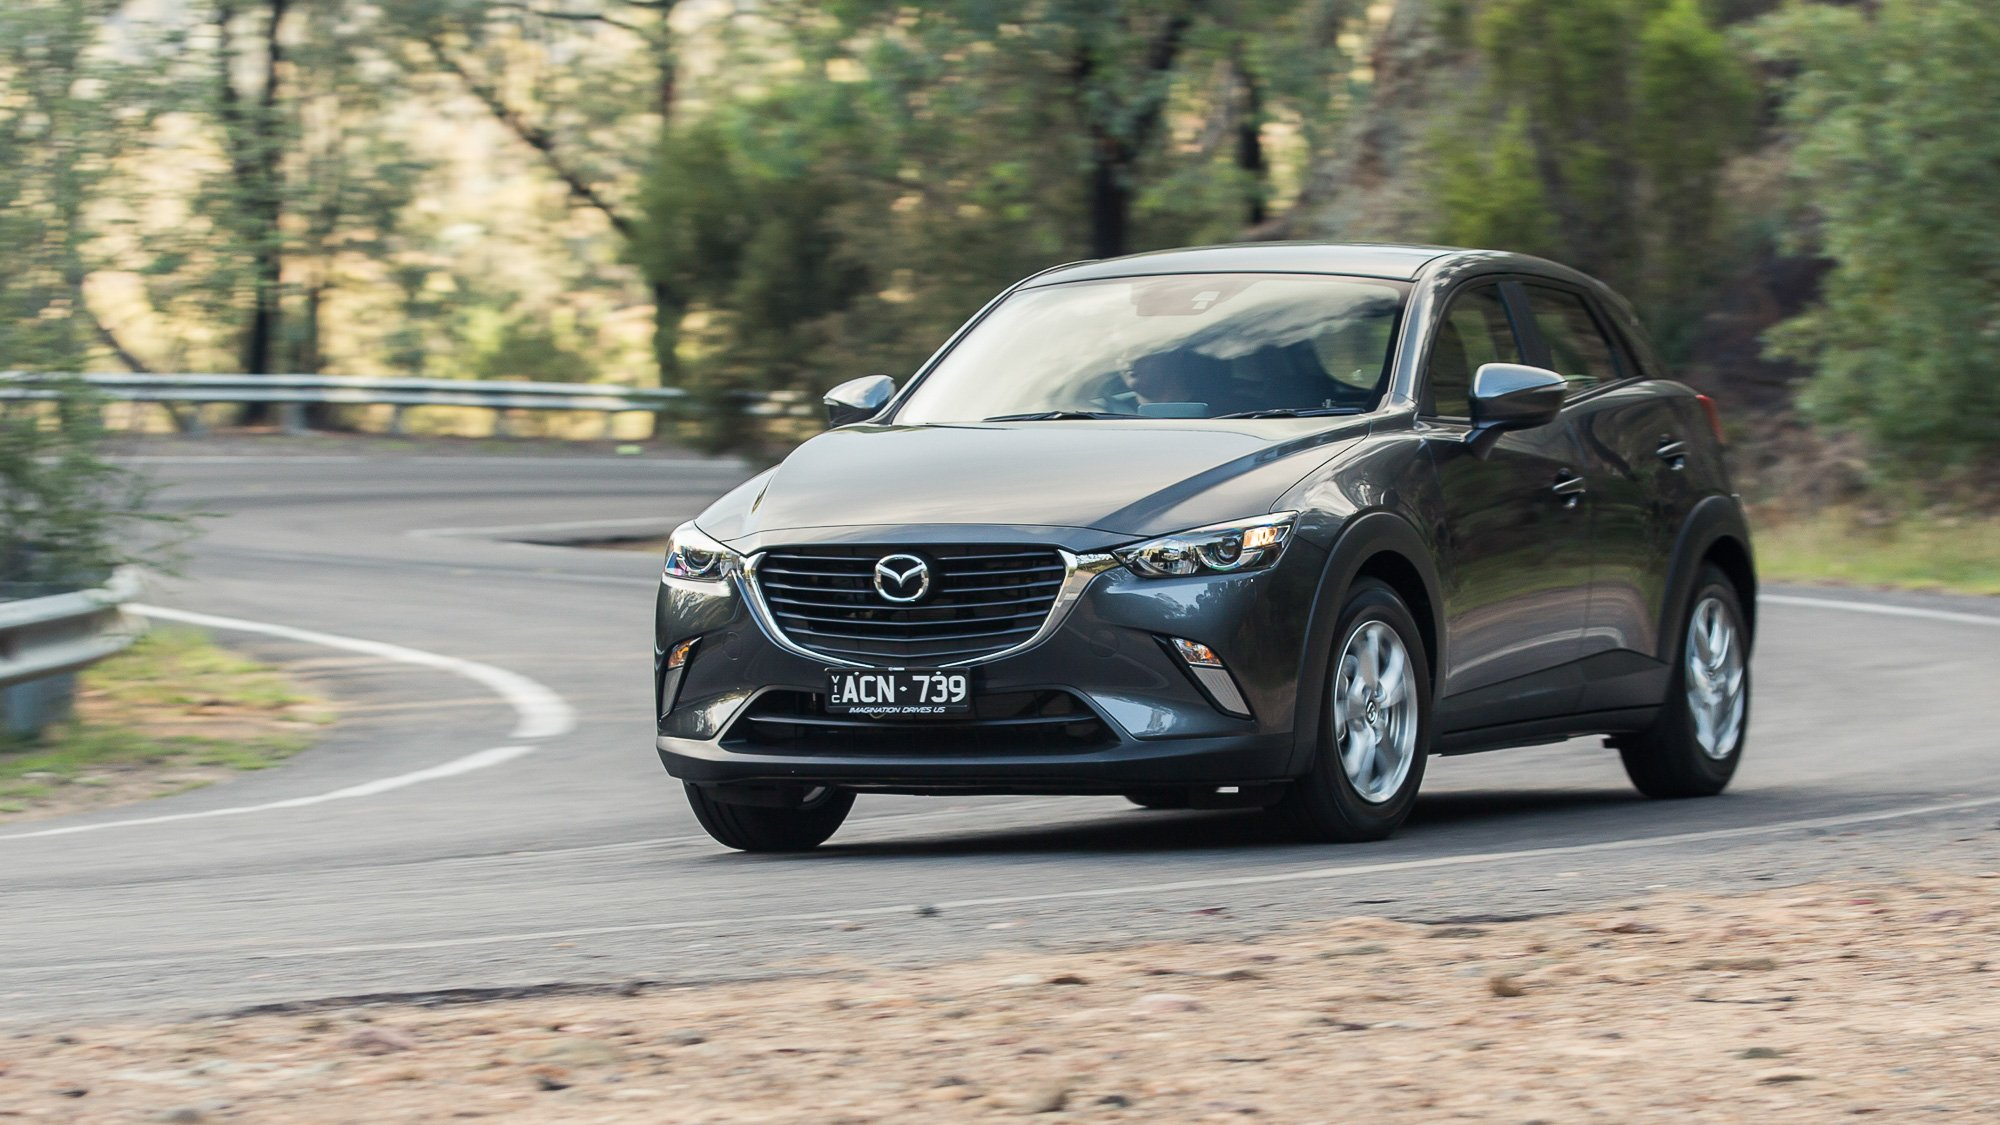 2015 Toyota Suv >> 2015 Mazda CX-3 Review | CarAdvice